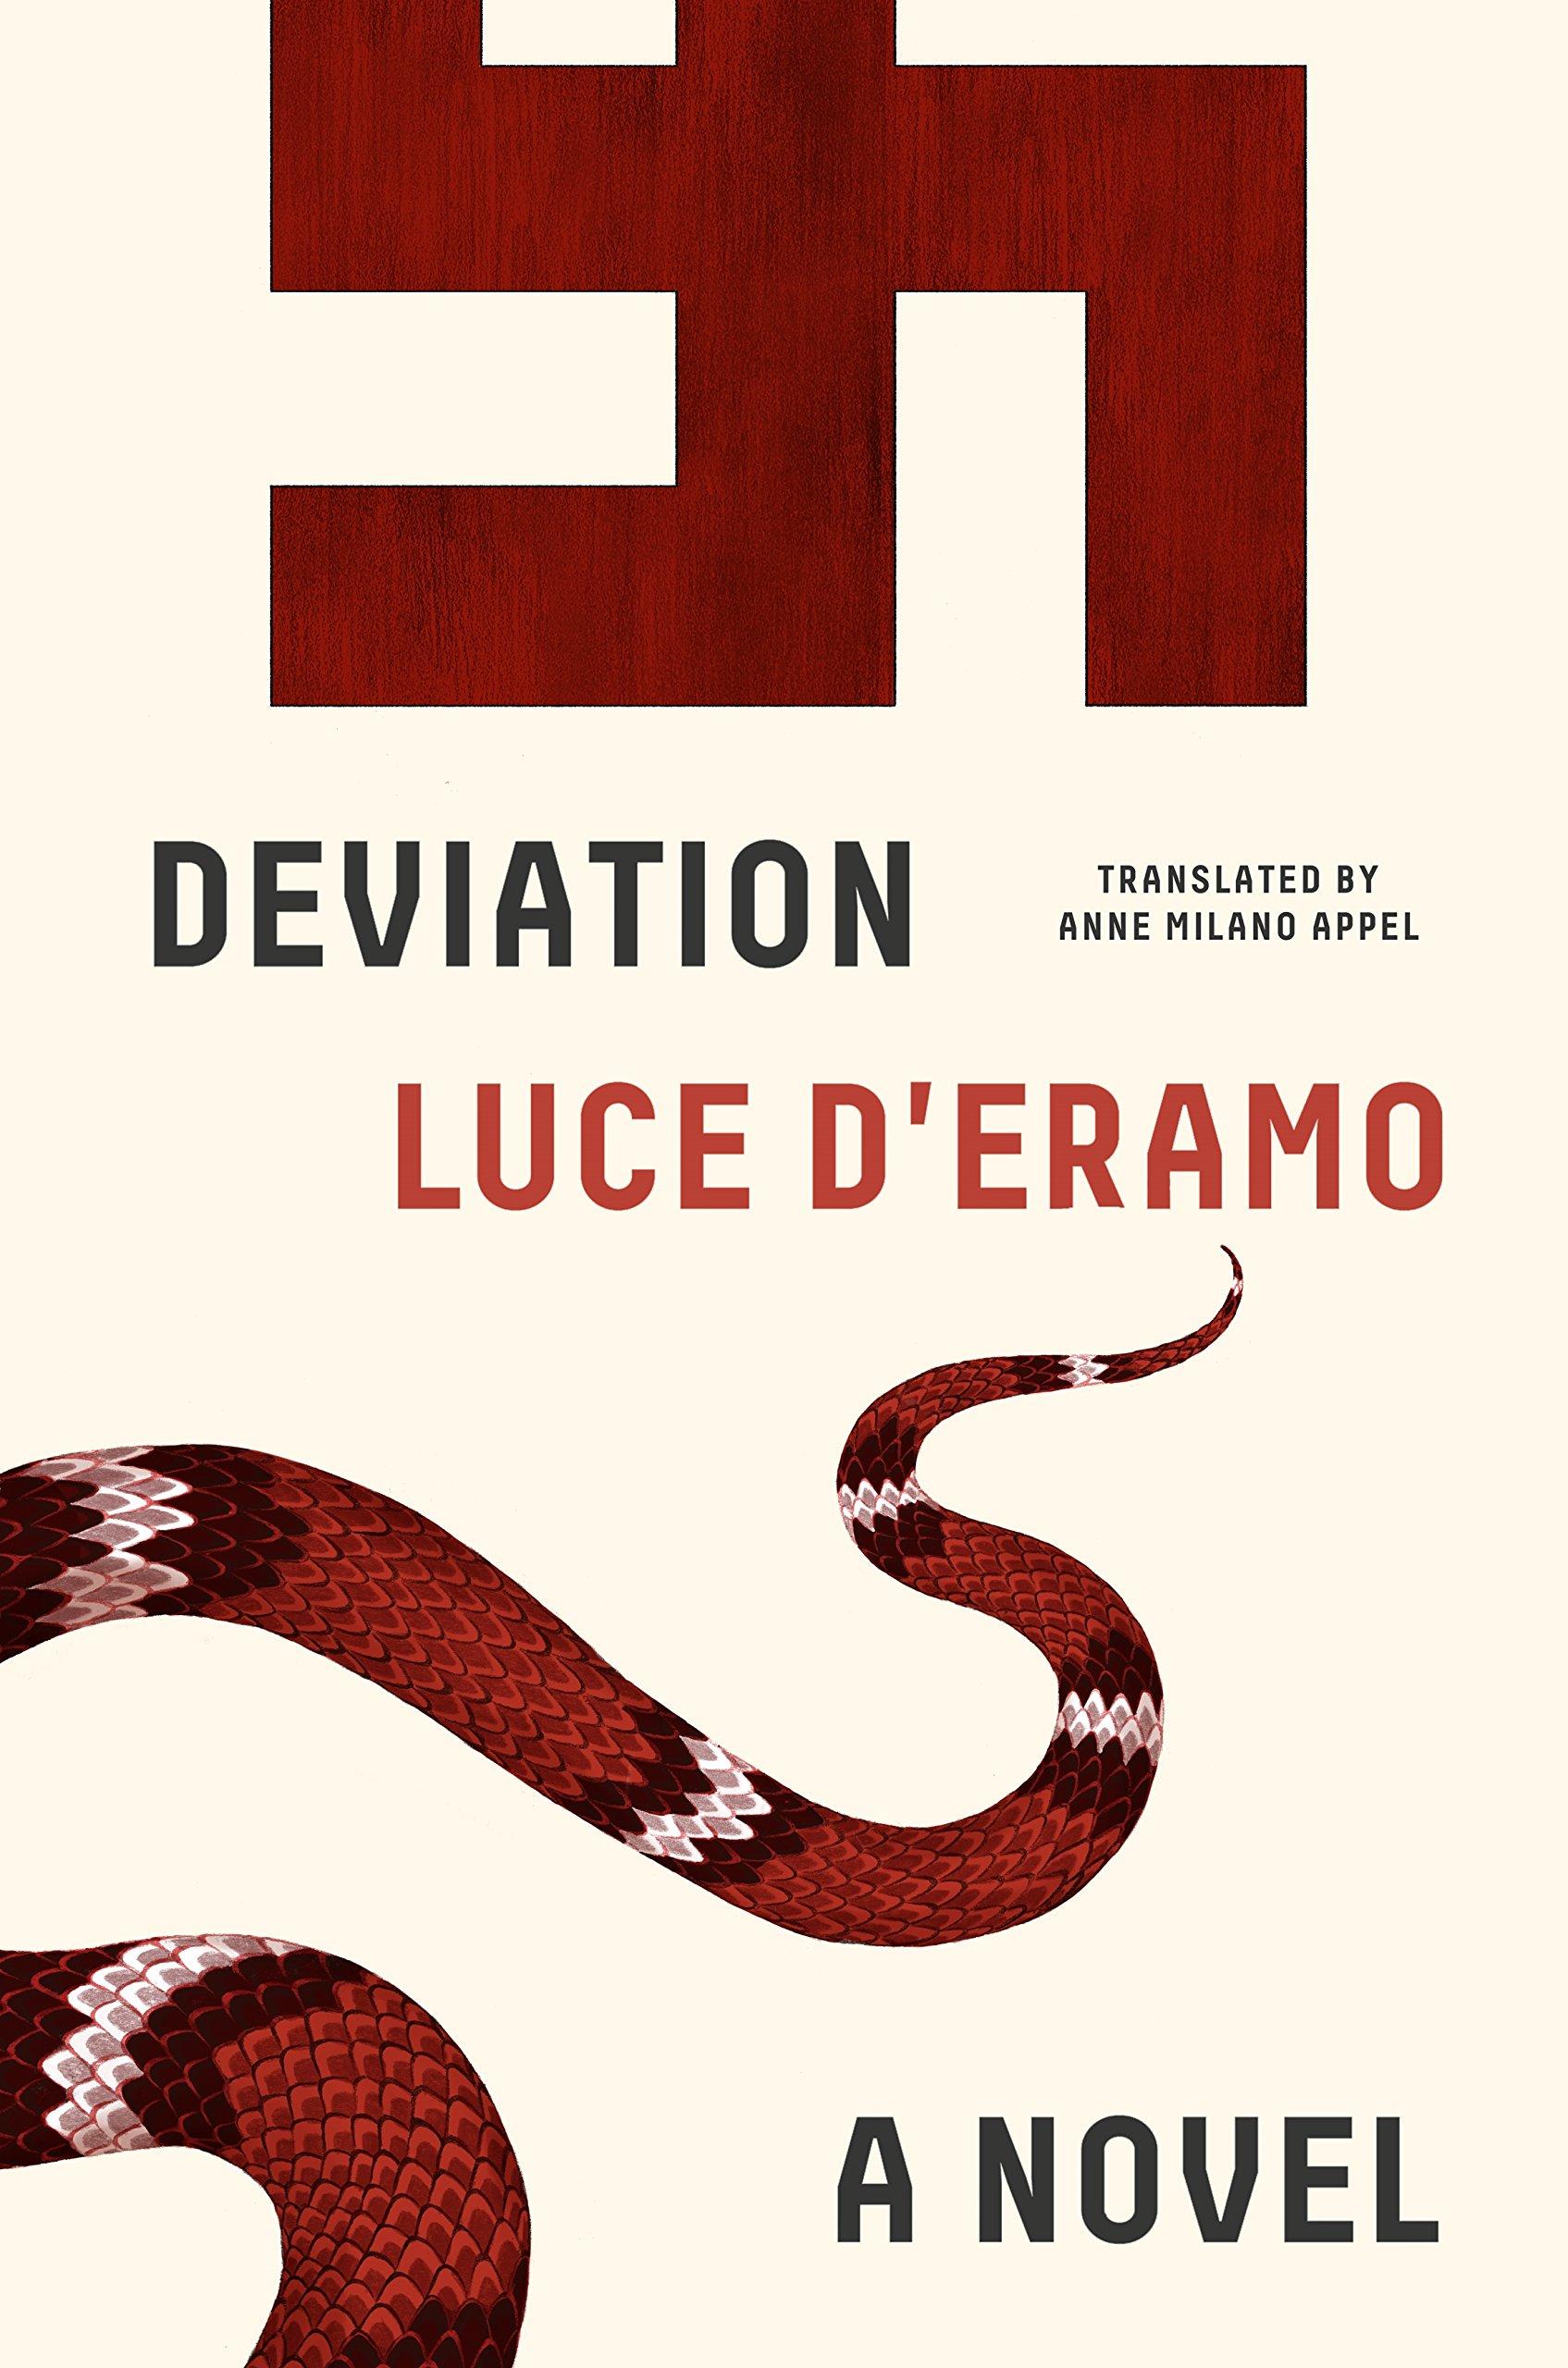 Deviation: A Novel